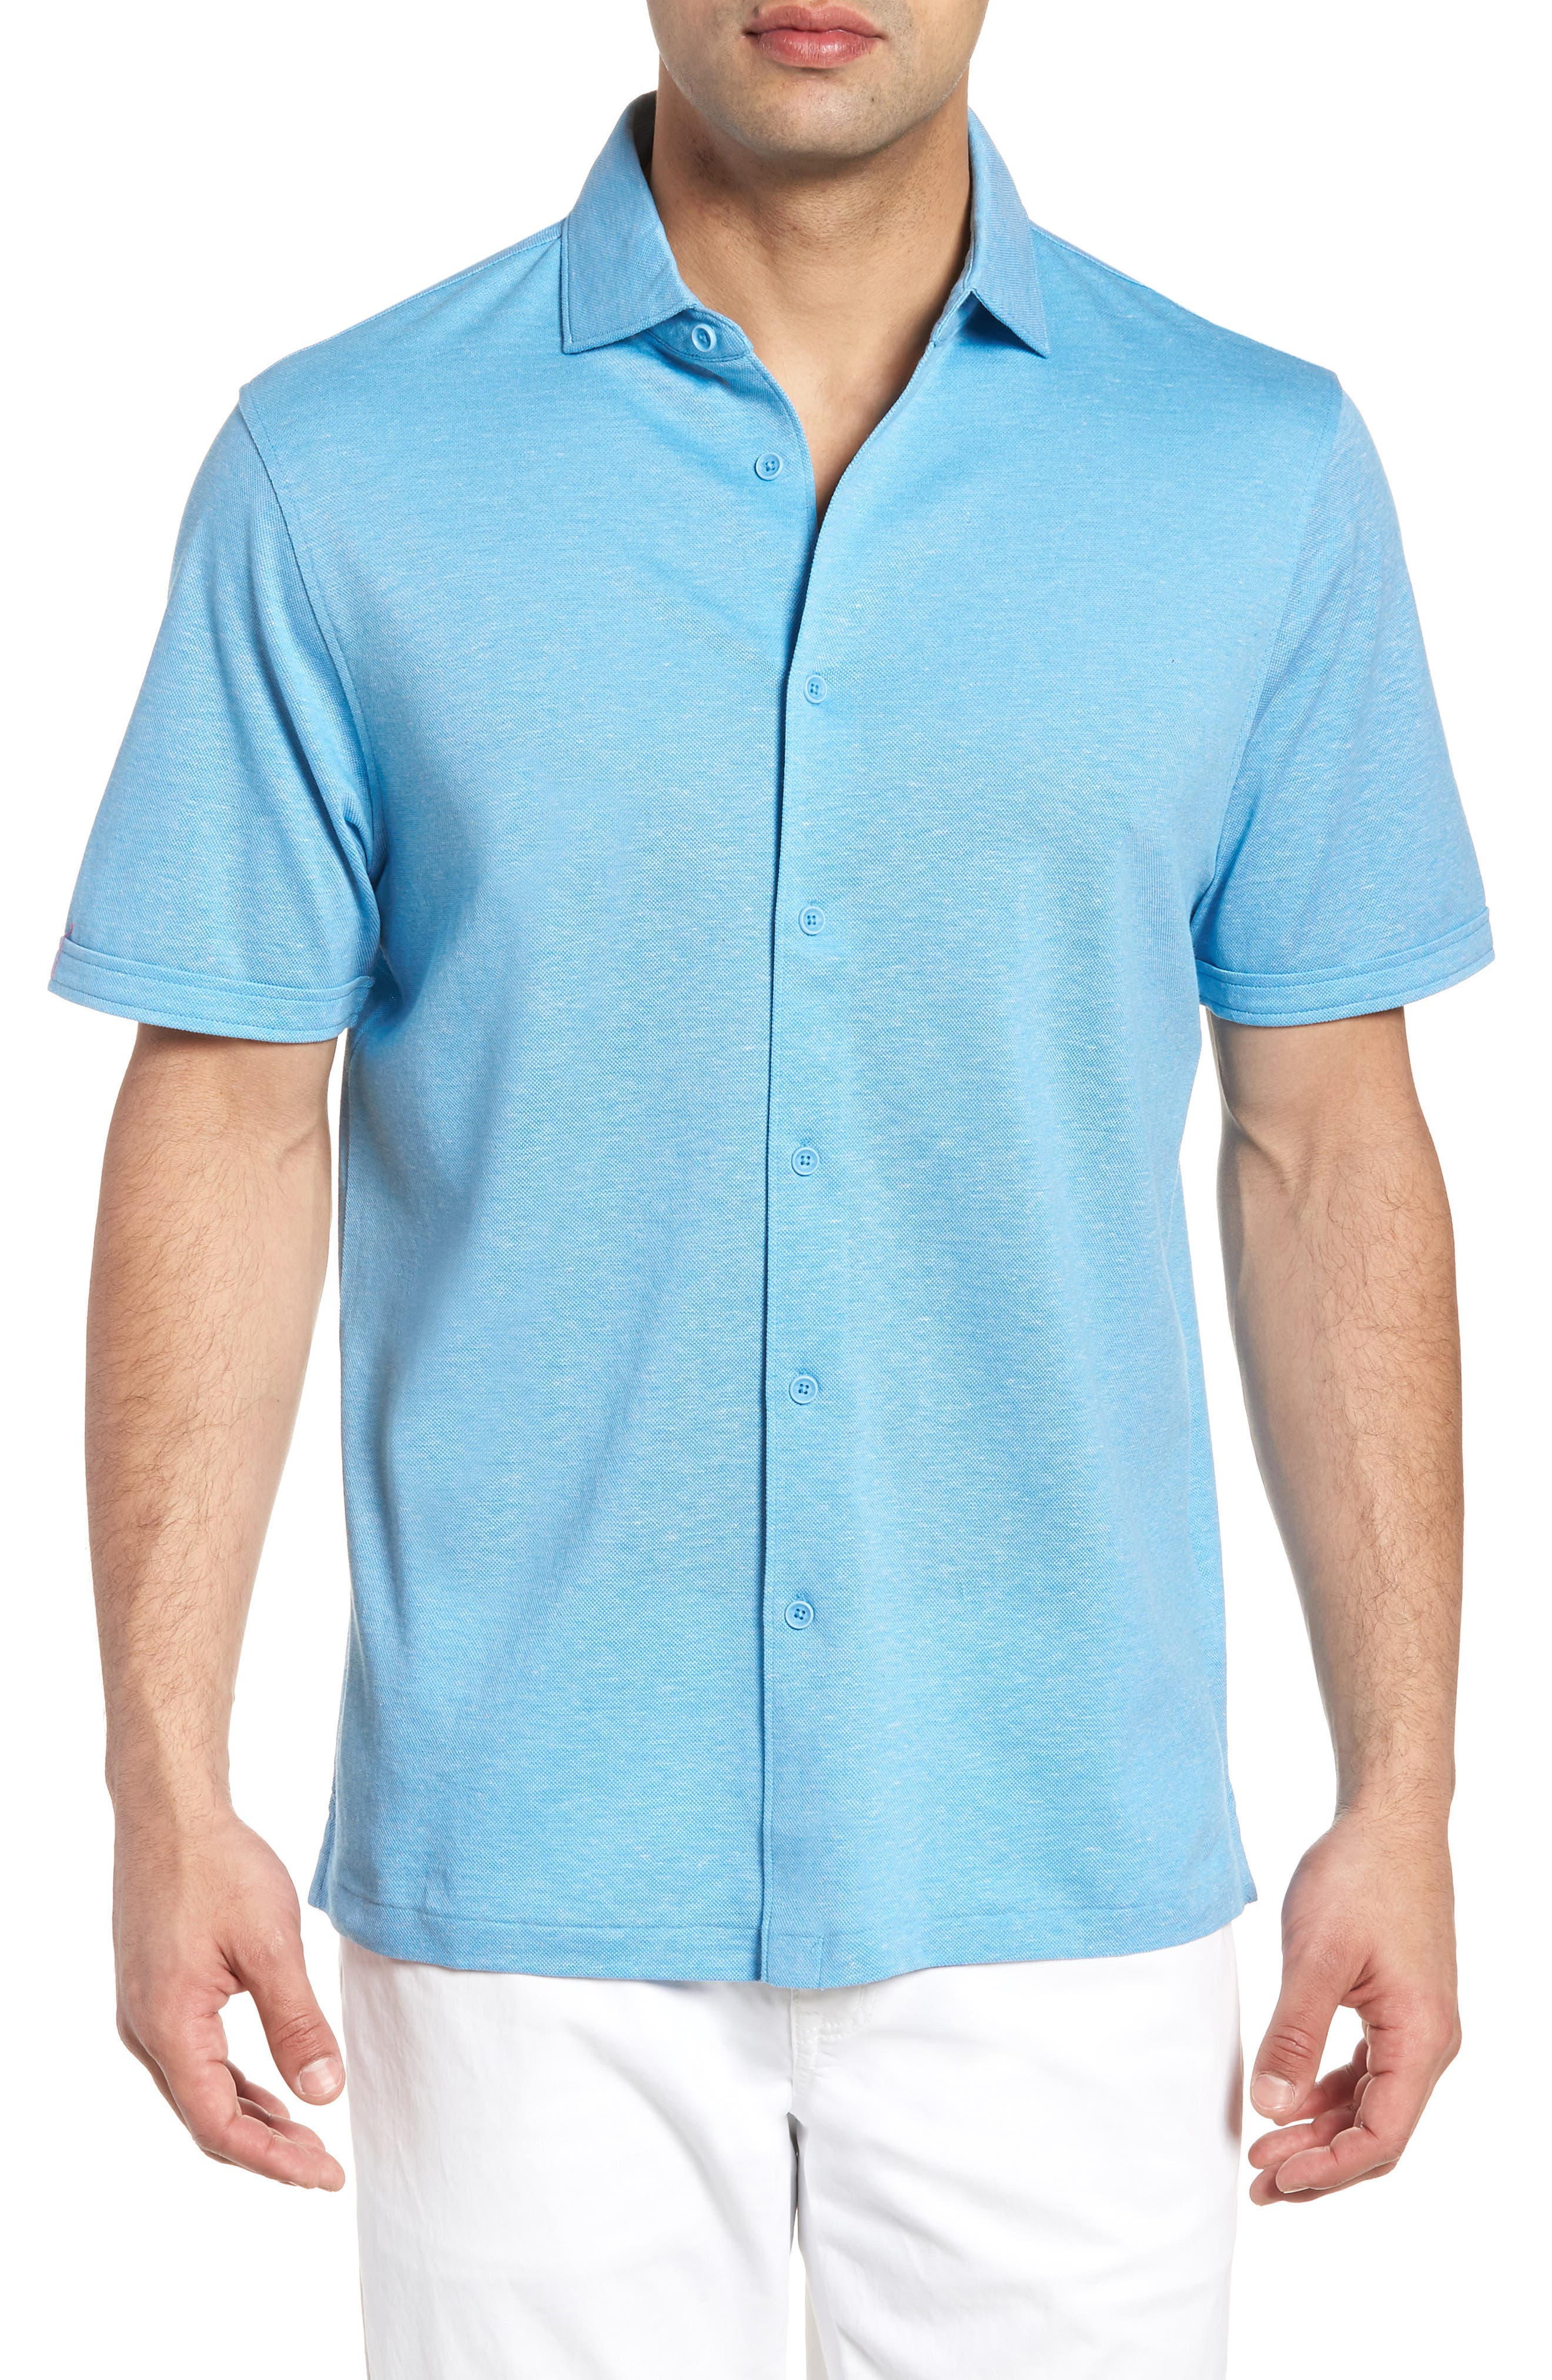 Regular Fit Heather Knit Sport Shirt,                             Main thumbnail 1, color,                             Air Blue